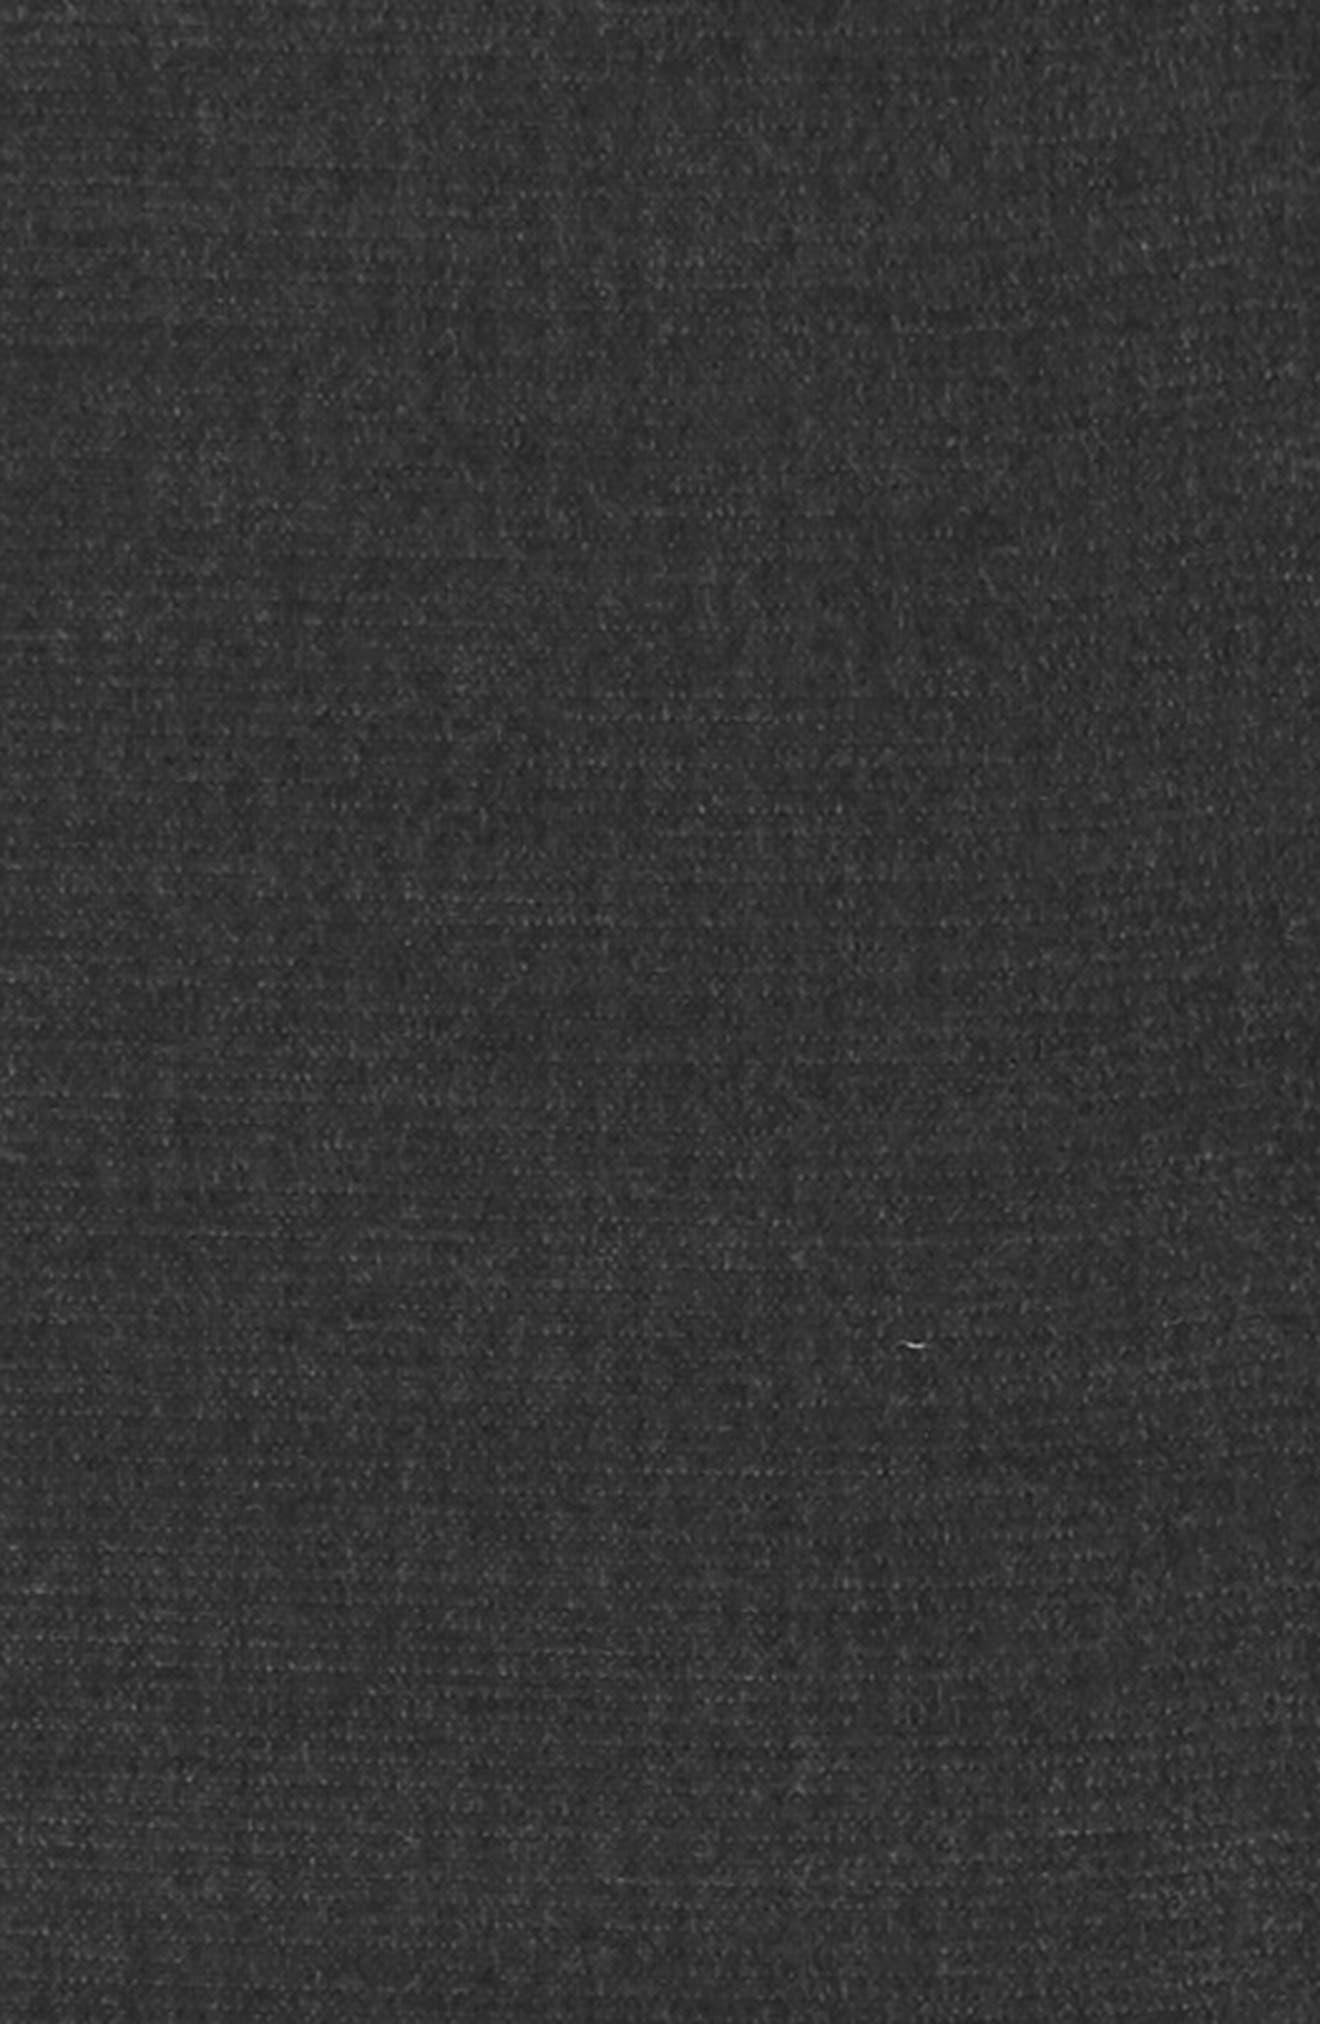 Plain Weave Silk Blend Scarf,                             Alternate thumbnail 3, color,                             021